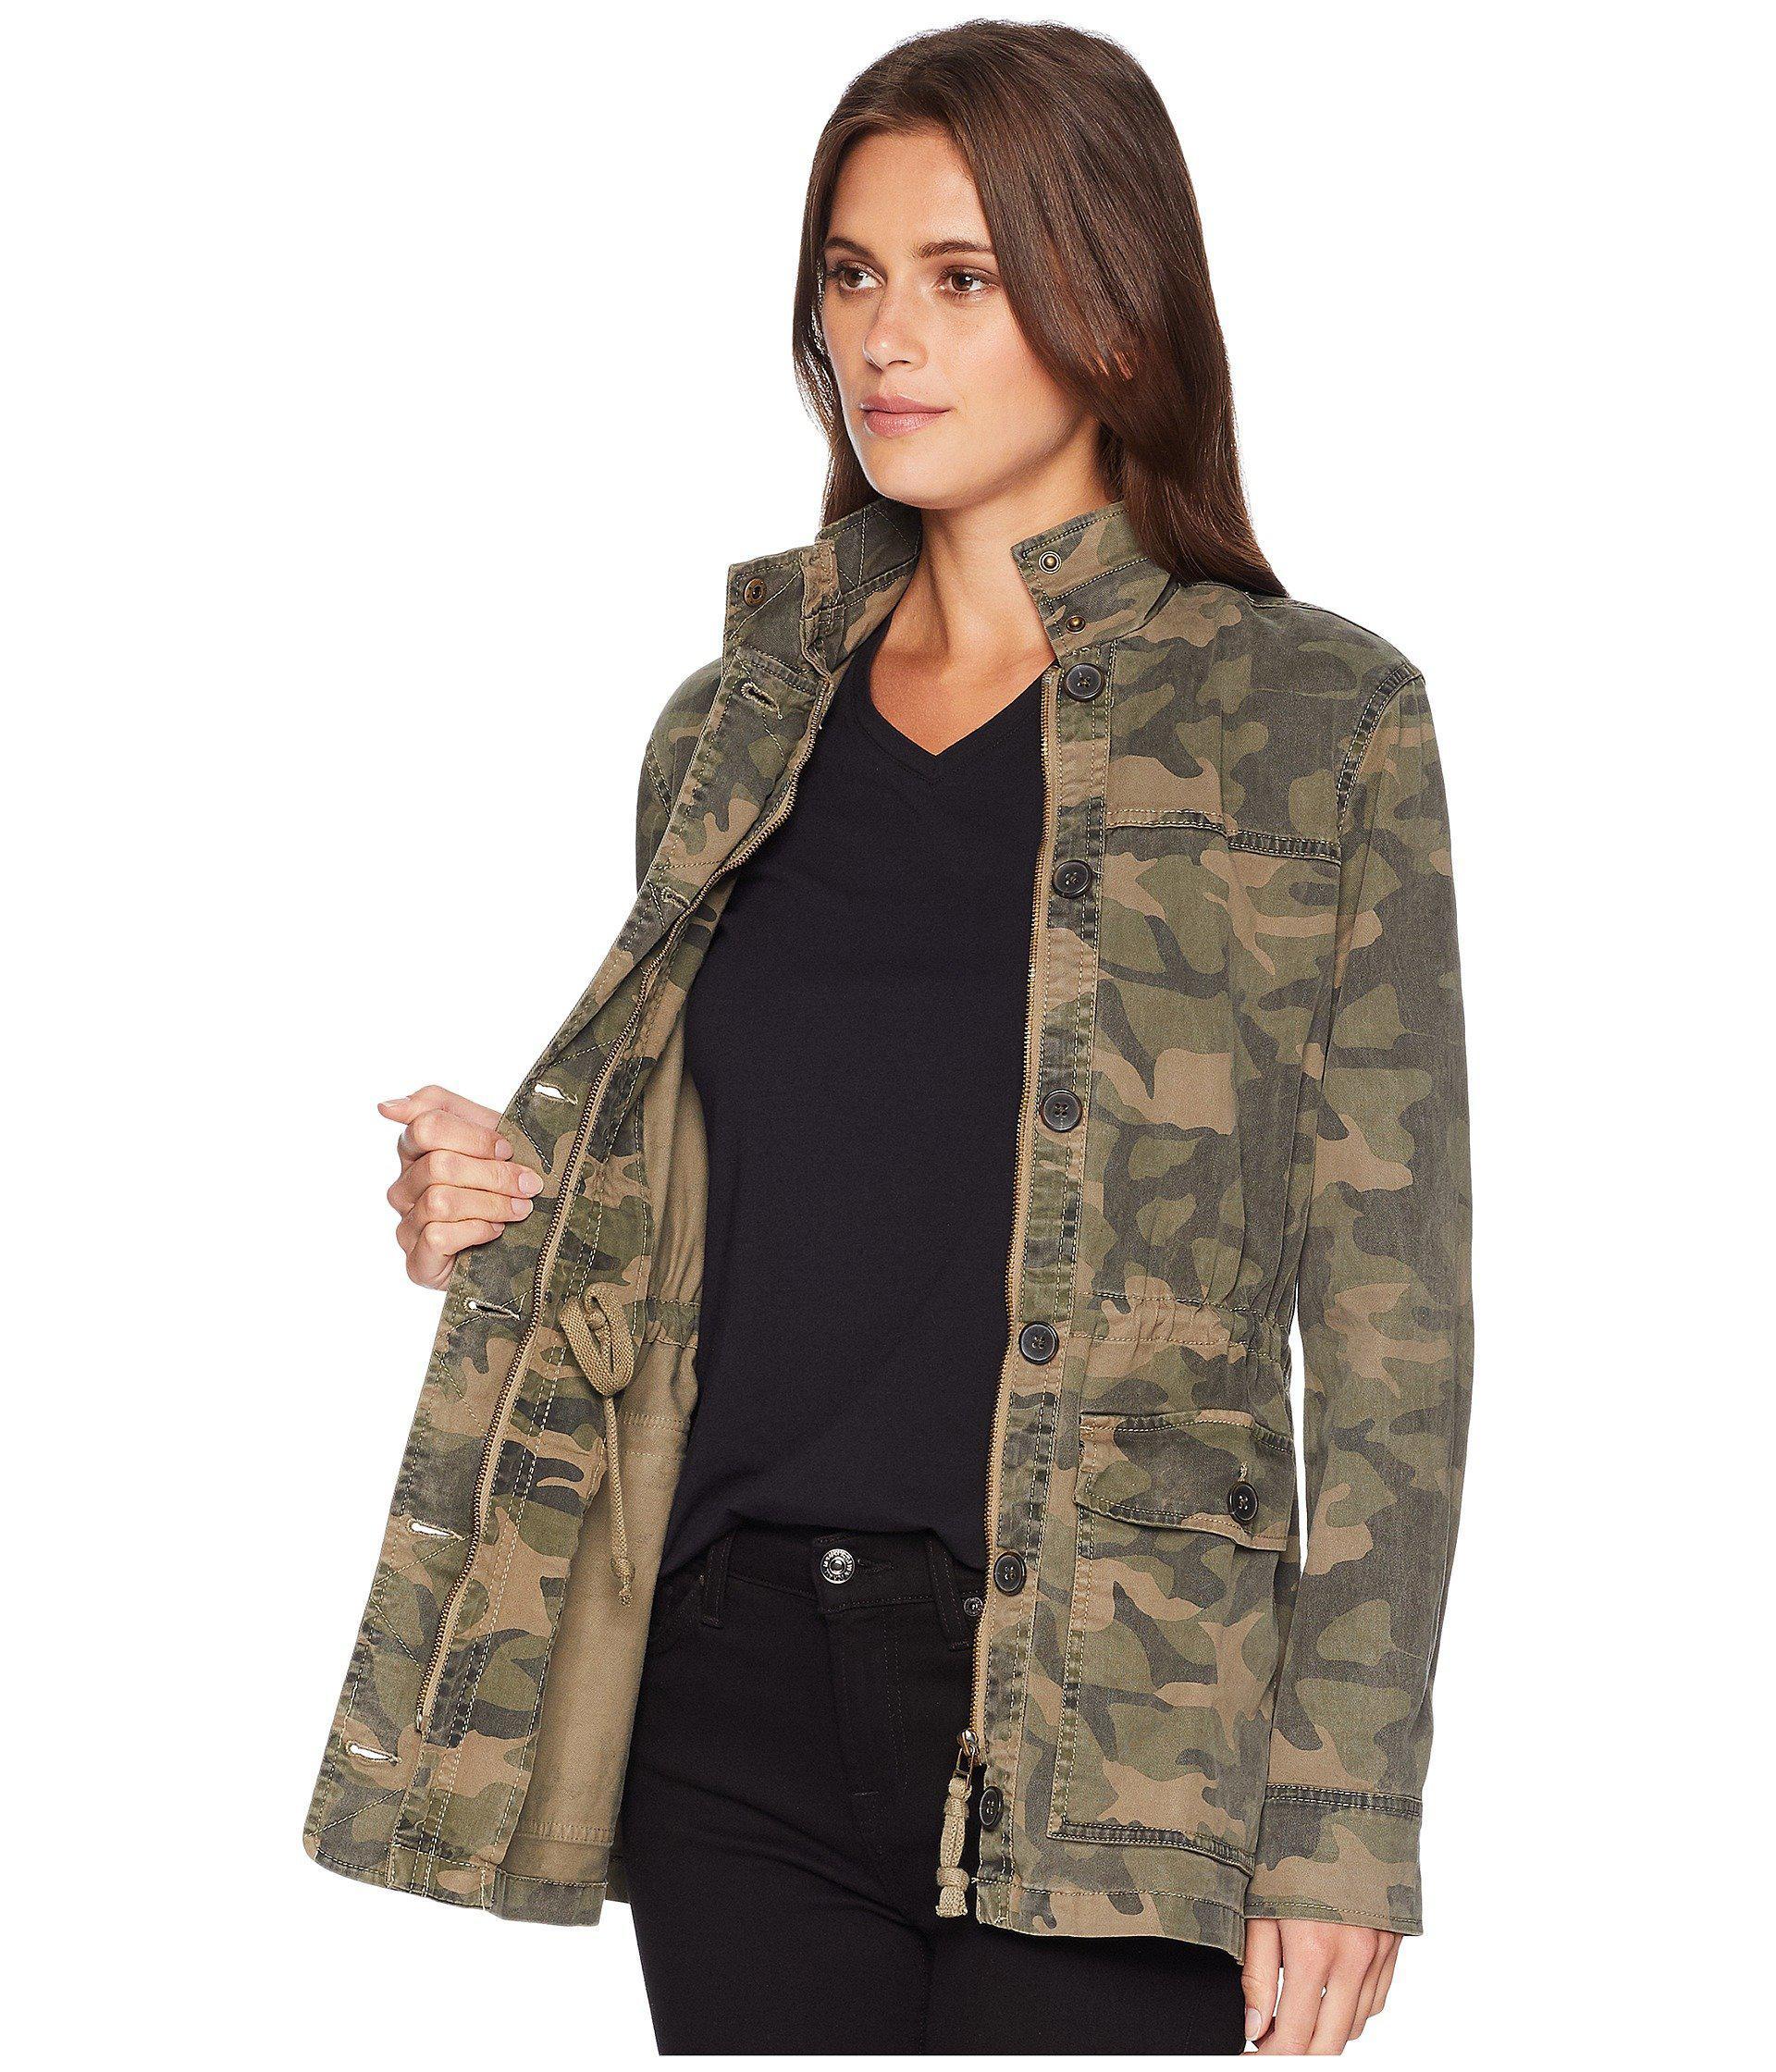 43484597c9816 Lucky Brand Camo Jacket (camo Olive Multi) Women's Coat in Green - Lyst